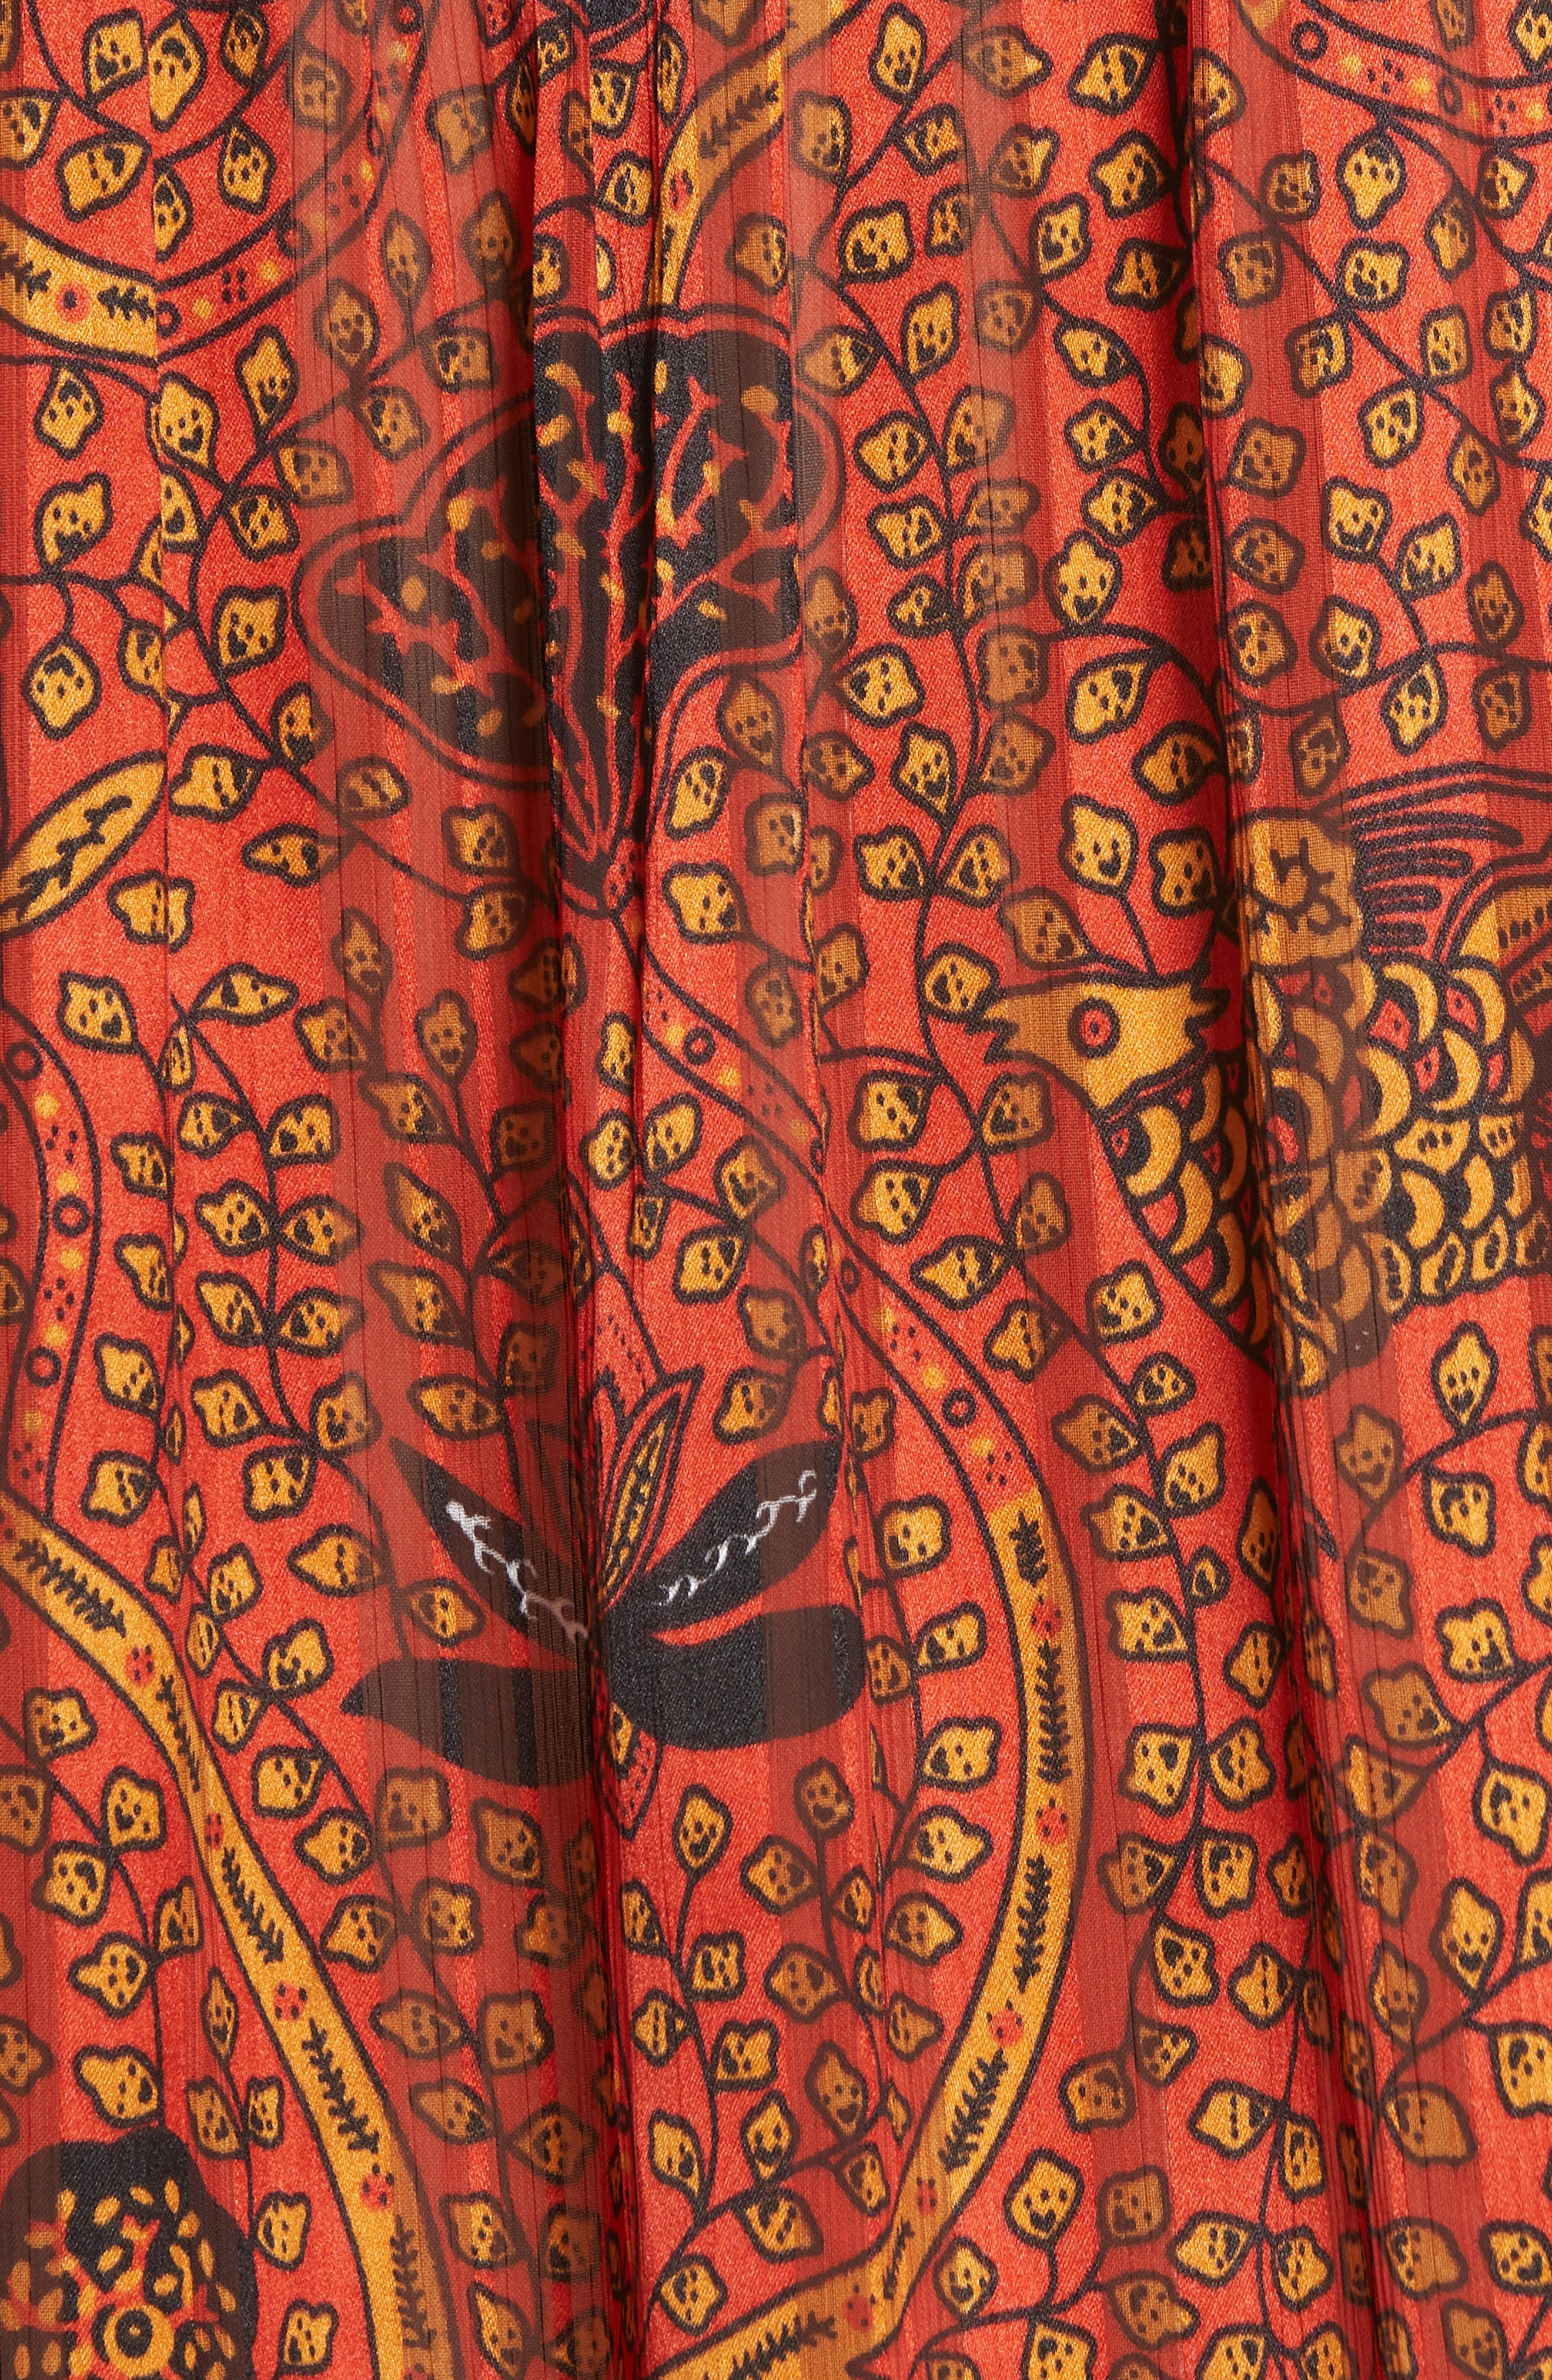 Danila Ruffle Collar Patterned Top,                             Alternate thumbnail 5, color,                             RED